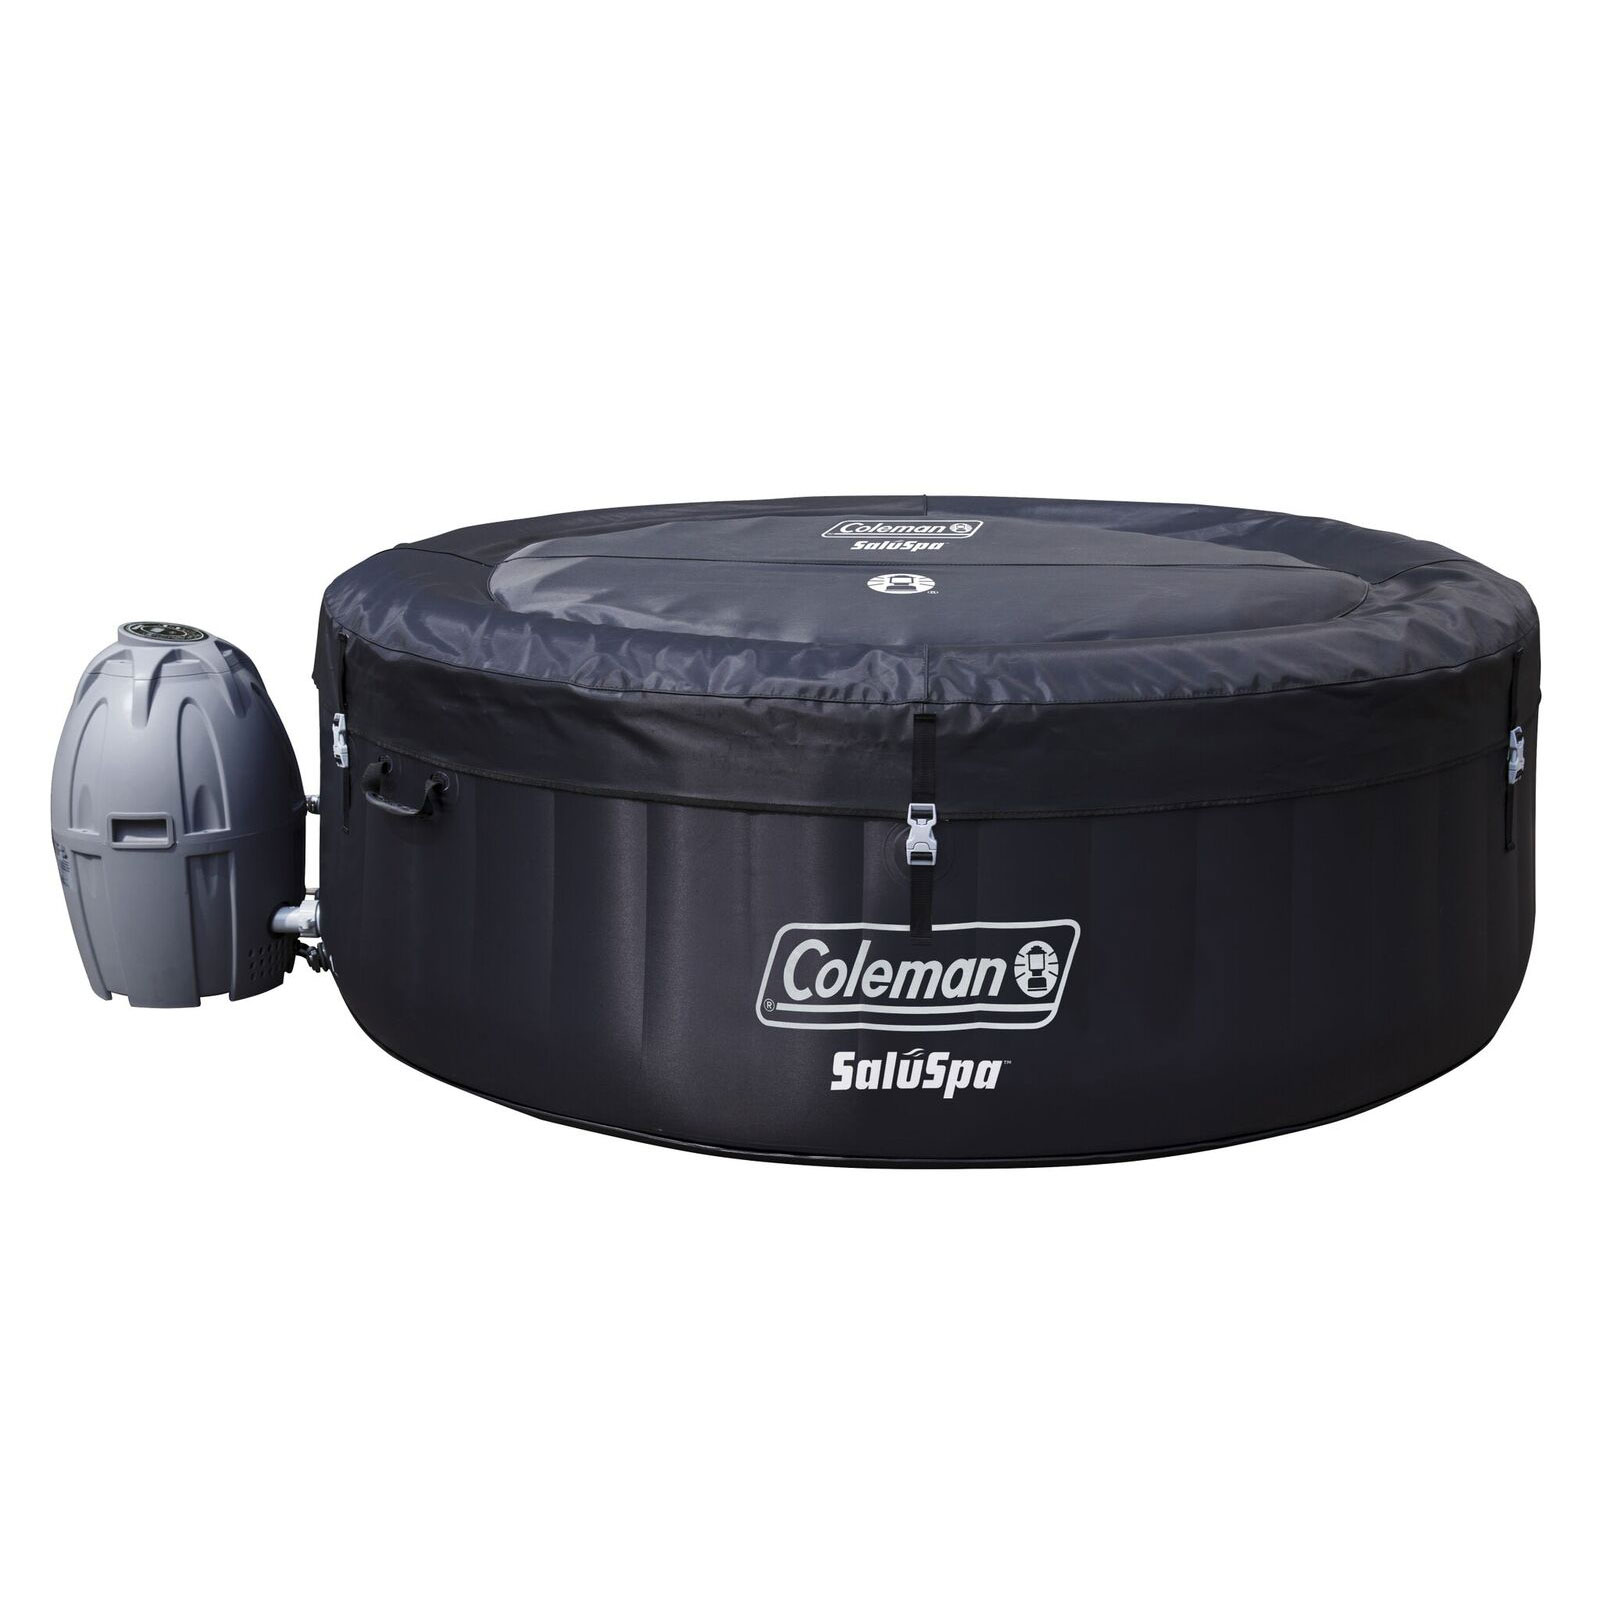 Portable Outdoor Kitchens: Coleman SaluSpa 4 Person Portable Inflatable Outdoor Spa